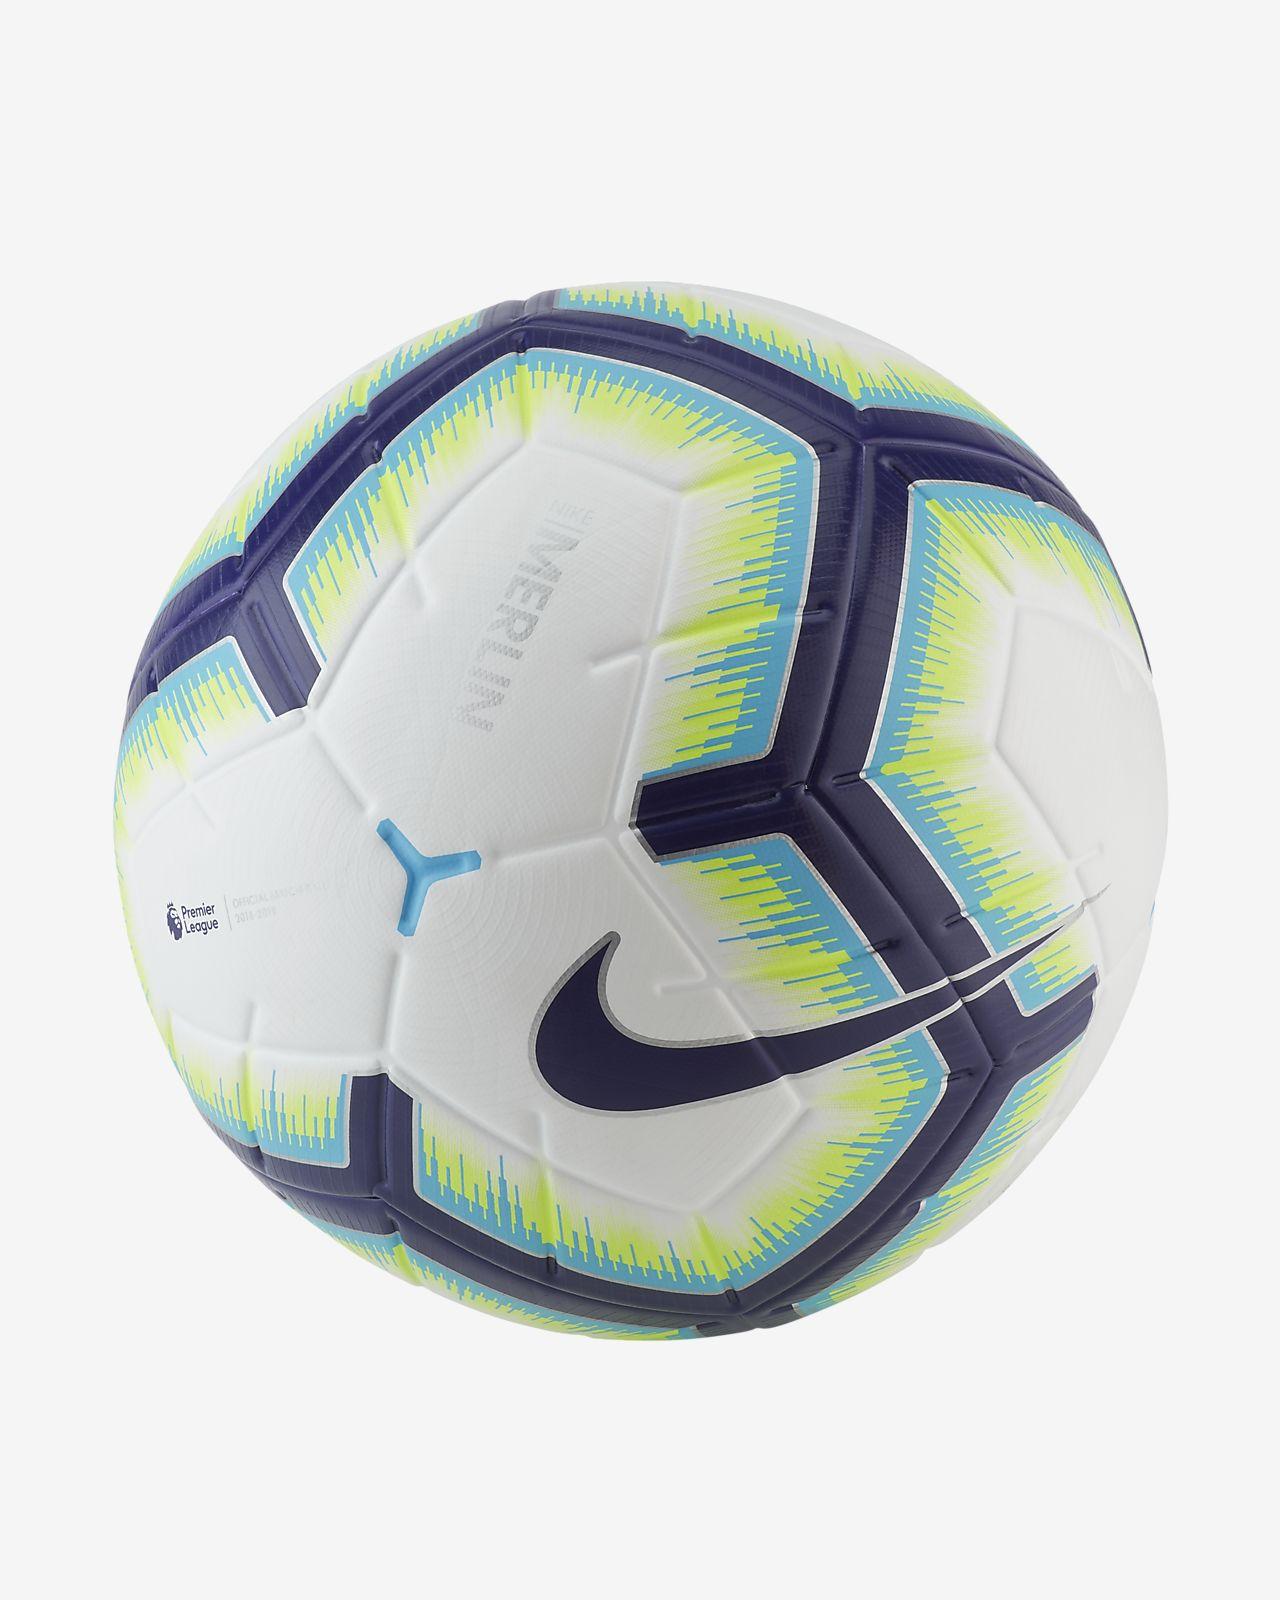 Premier League Merlin futball-labda